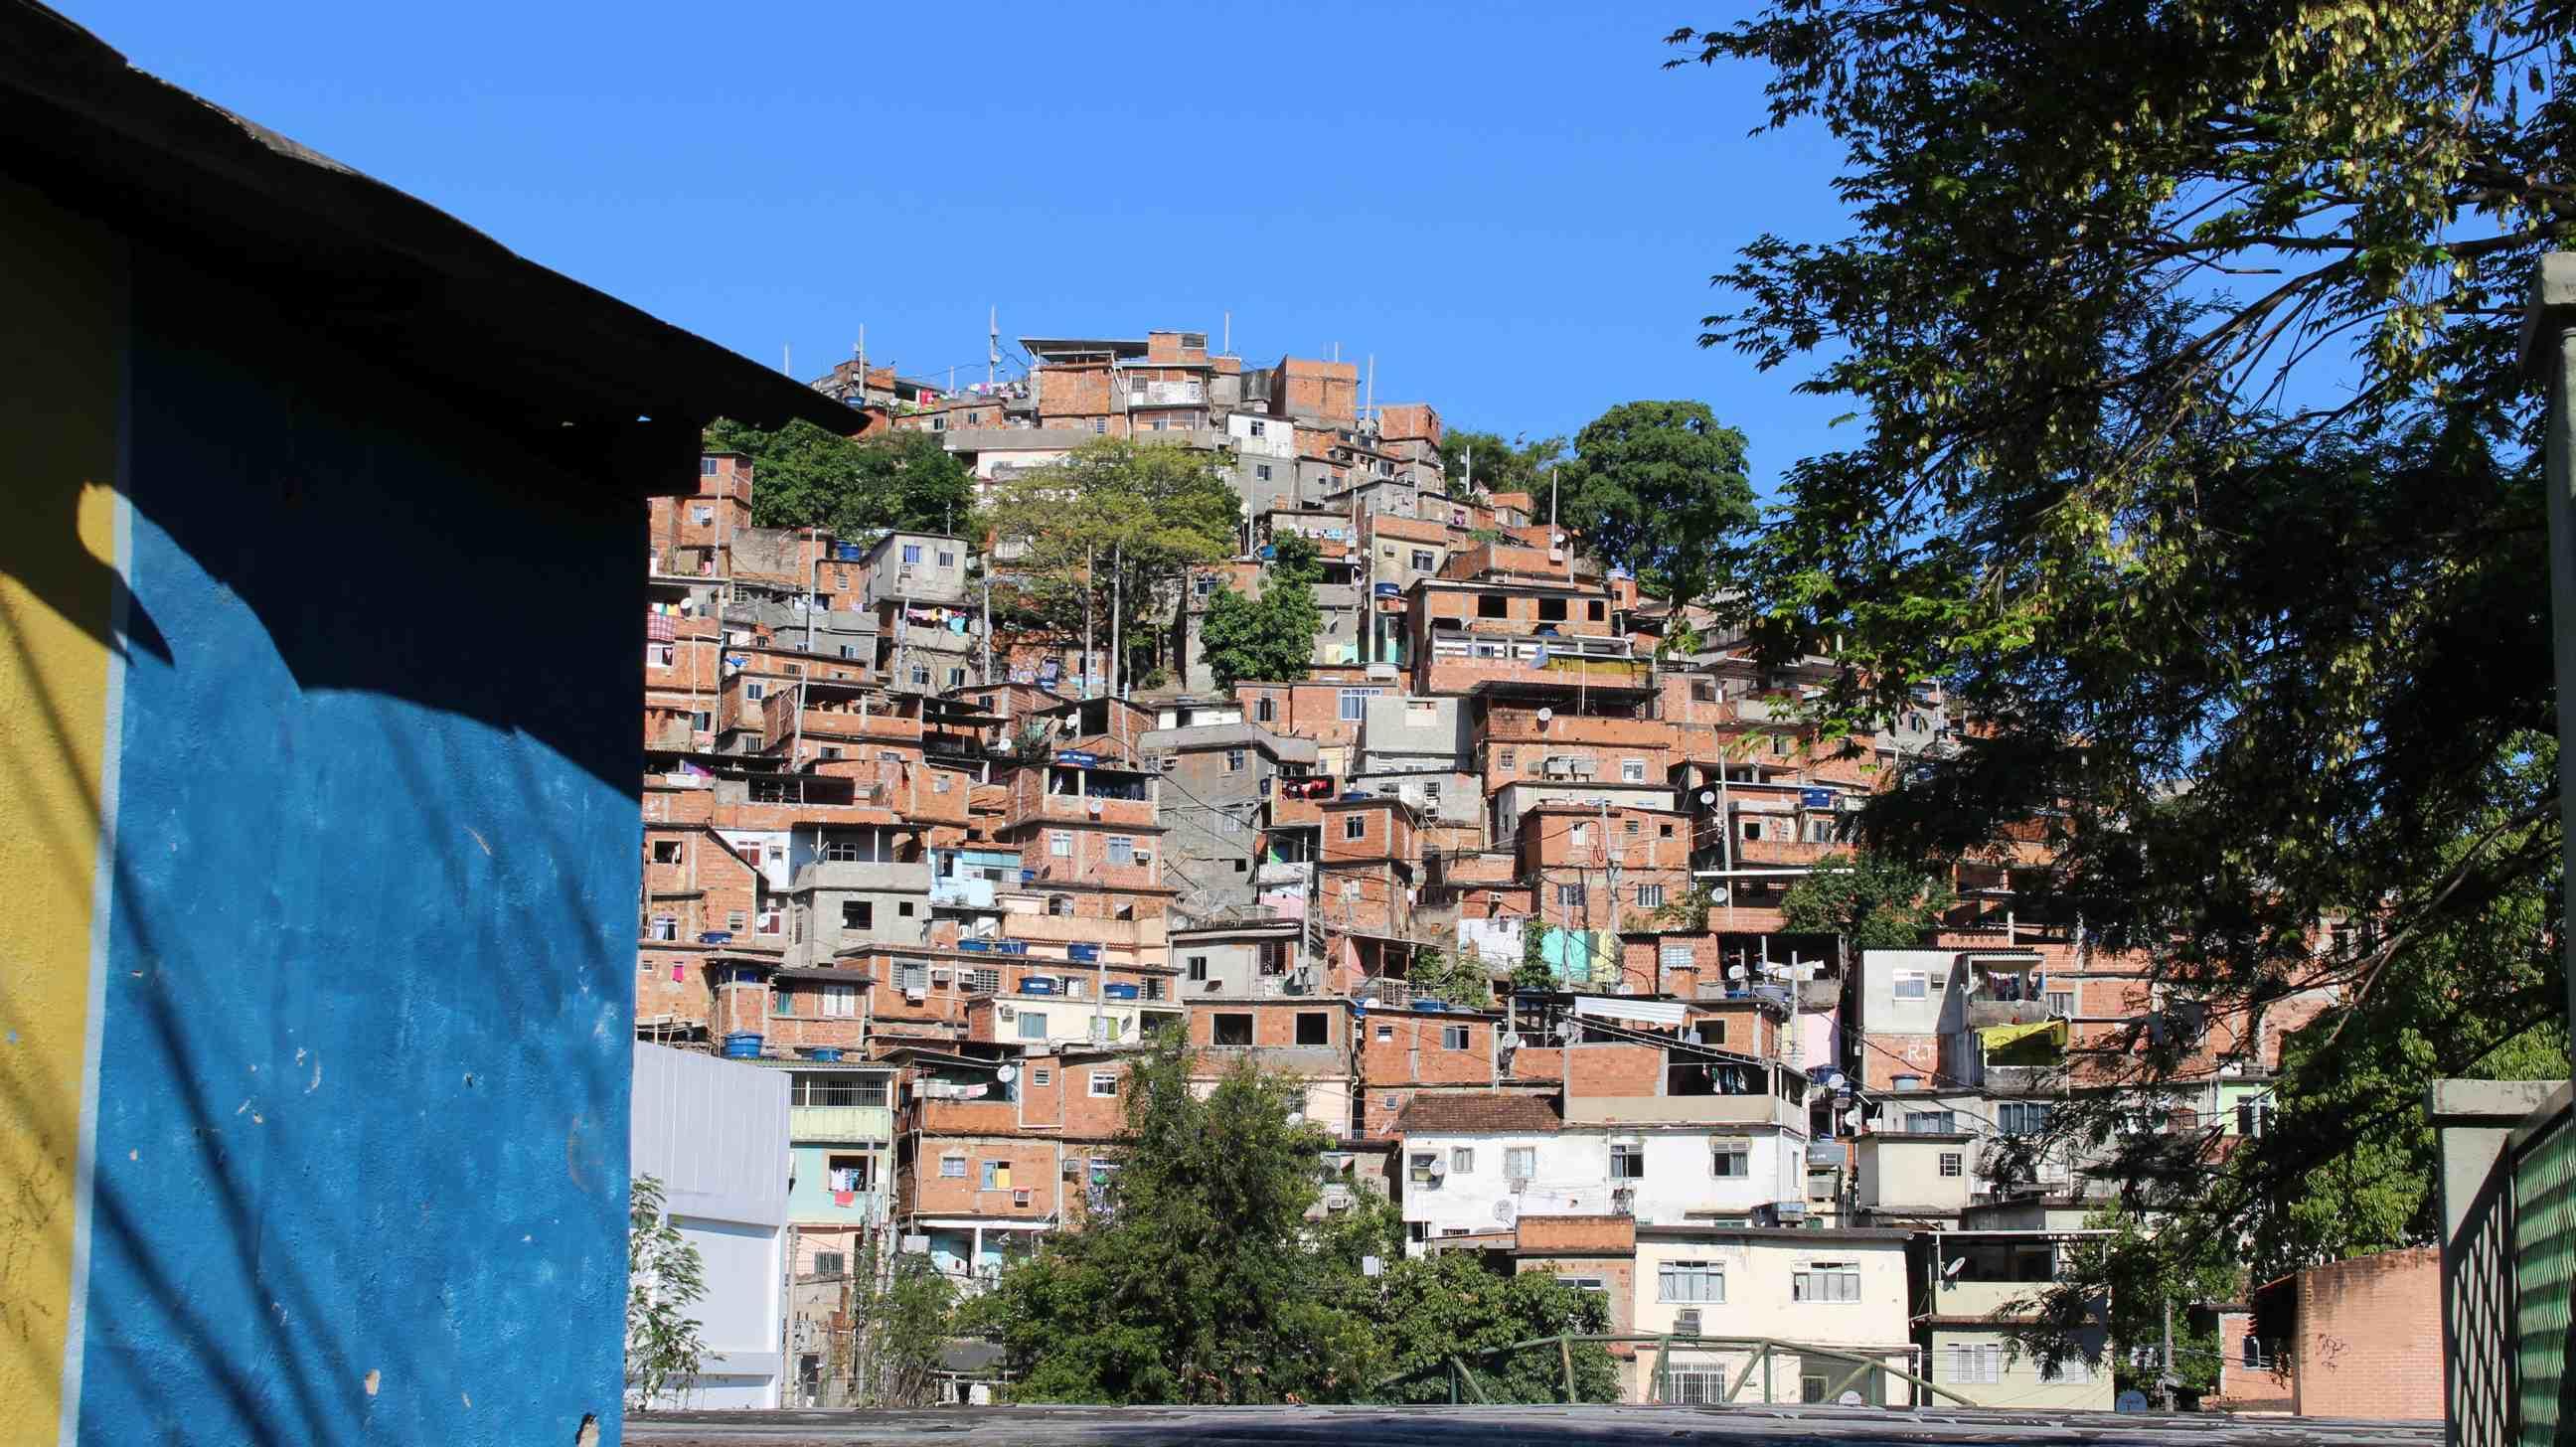 Resultado de imagen para favela de macacos